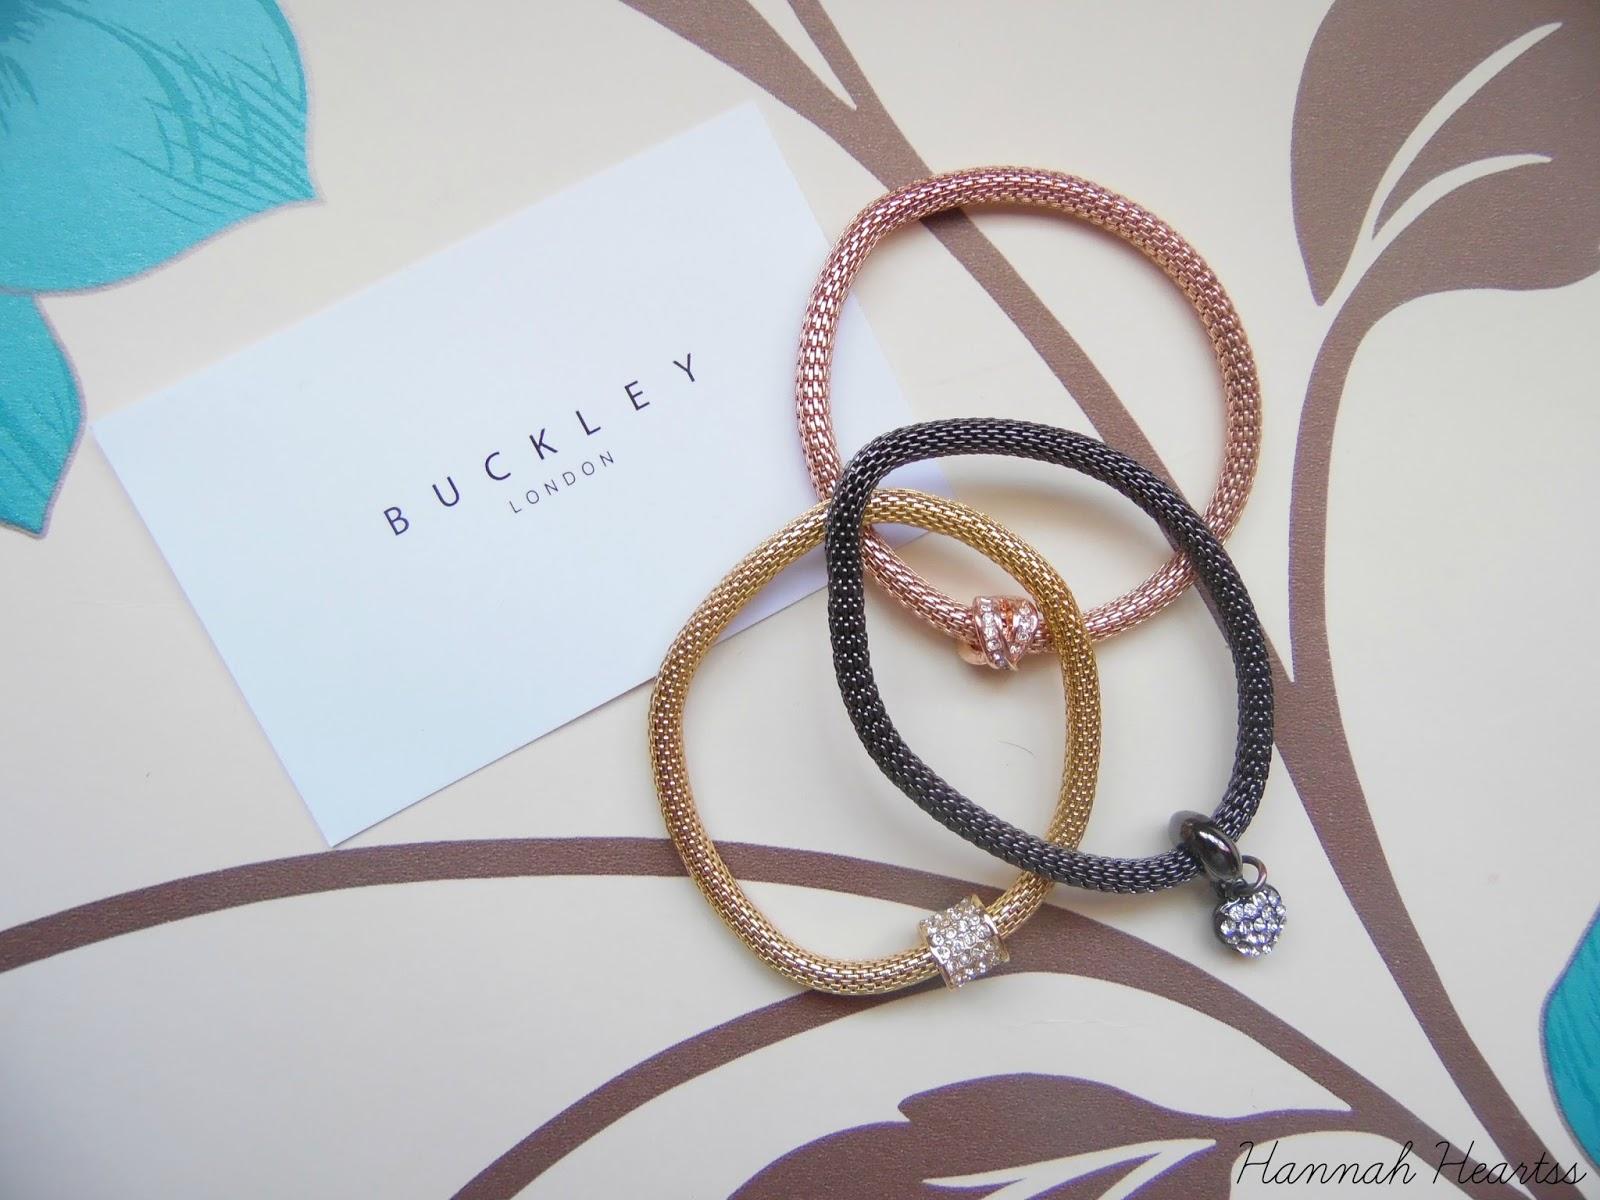 Buckley London Sparkle Mesh Bracelets